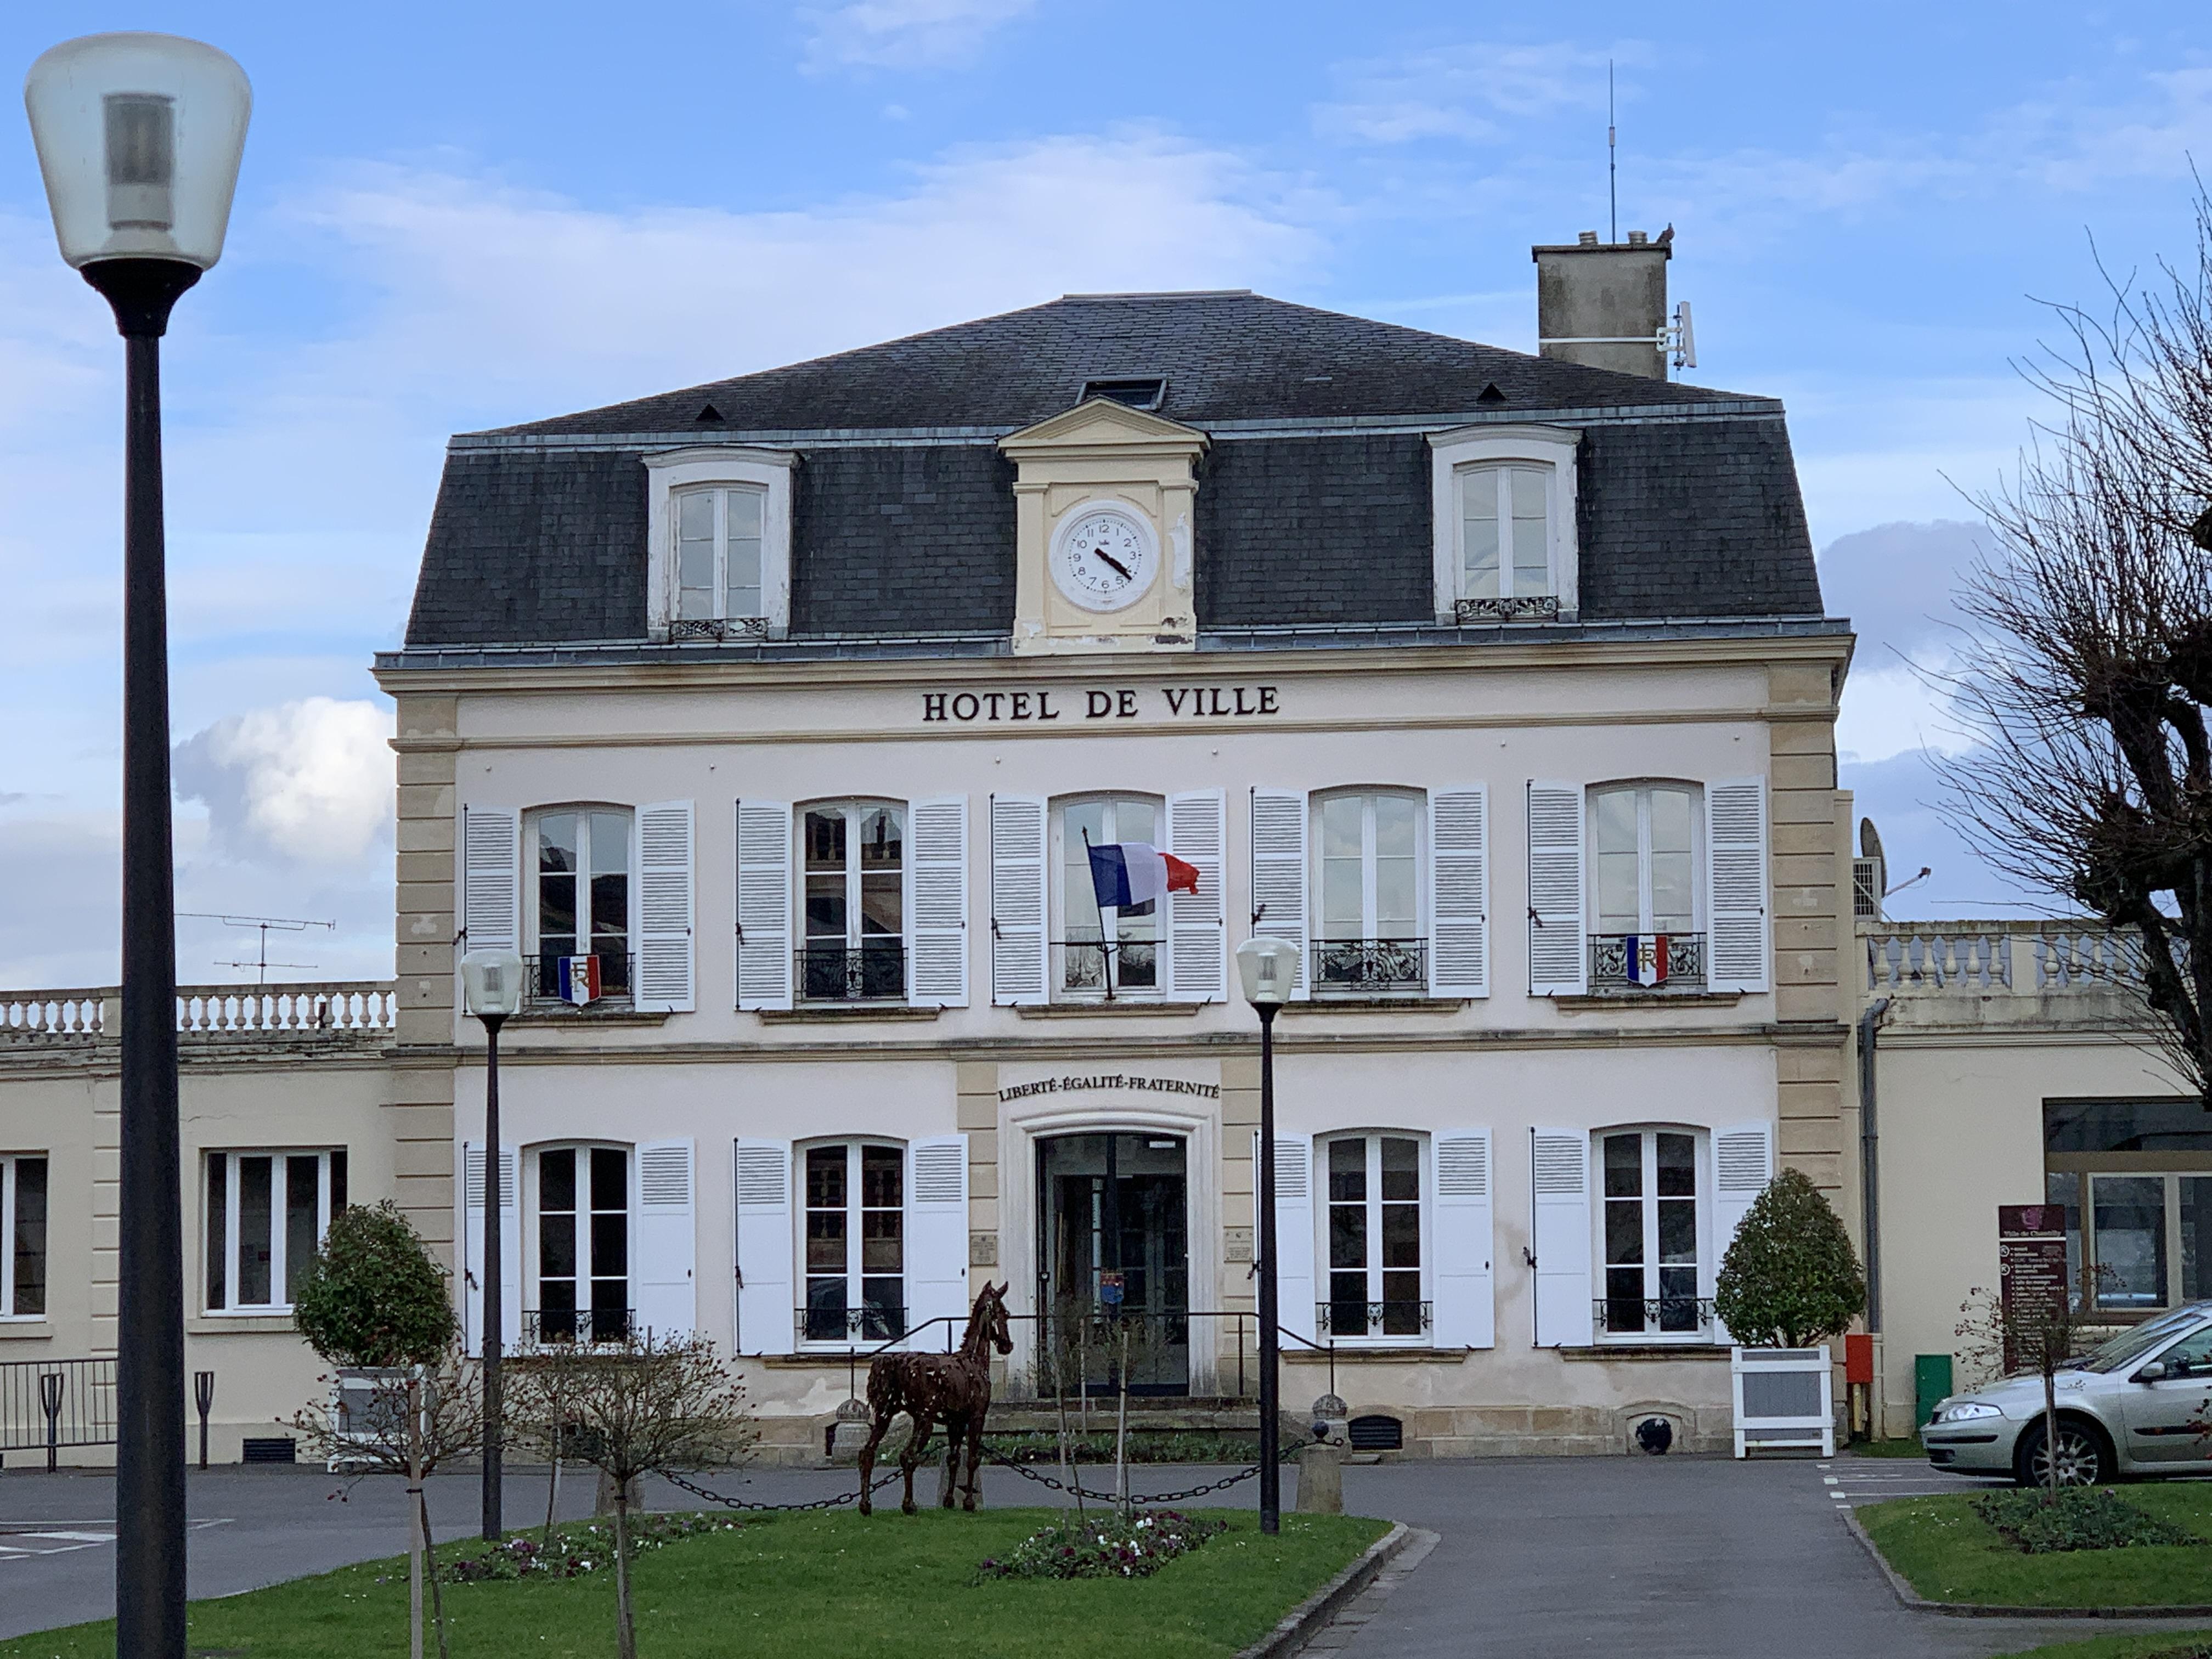 Deco Allee De Maison chantilly, oise - wikipedia